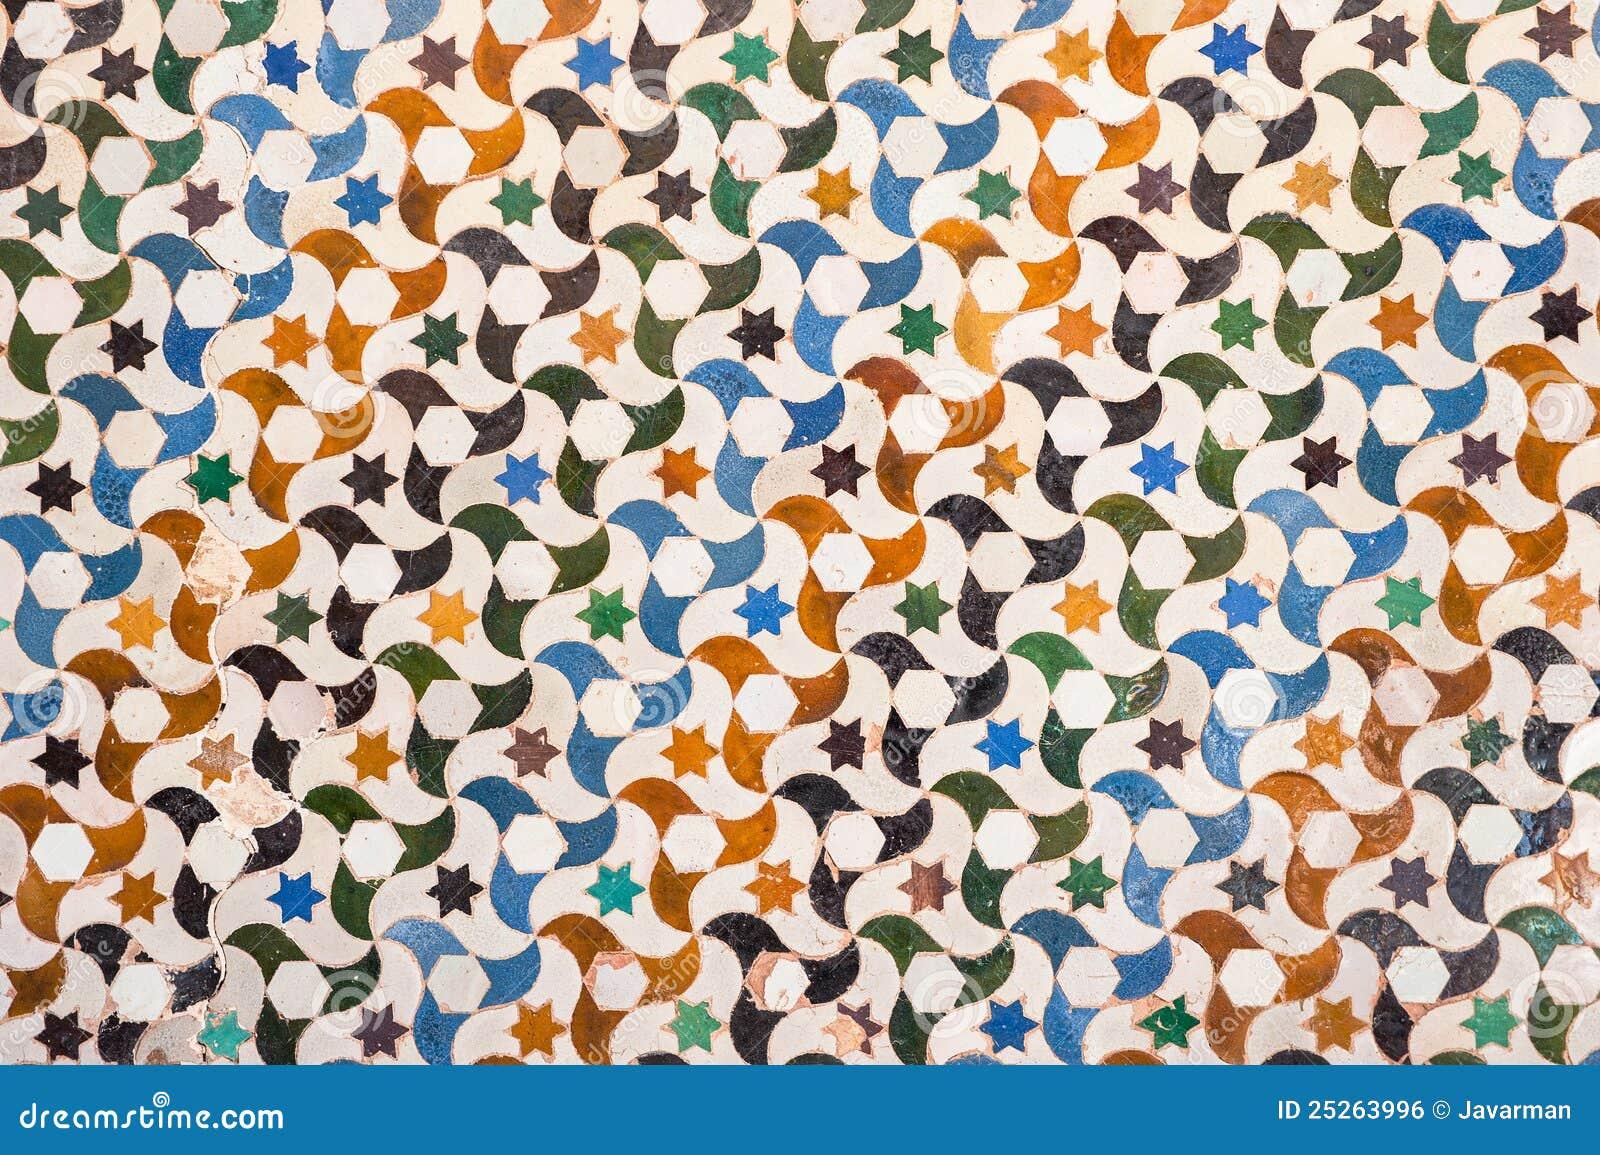 Tile Decoration Alhambra Palace Spain Stock Photo